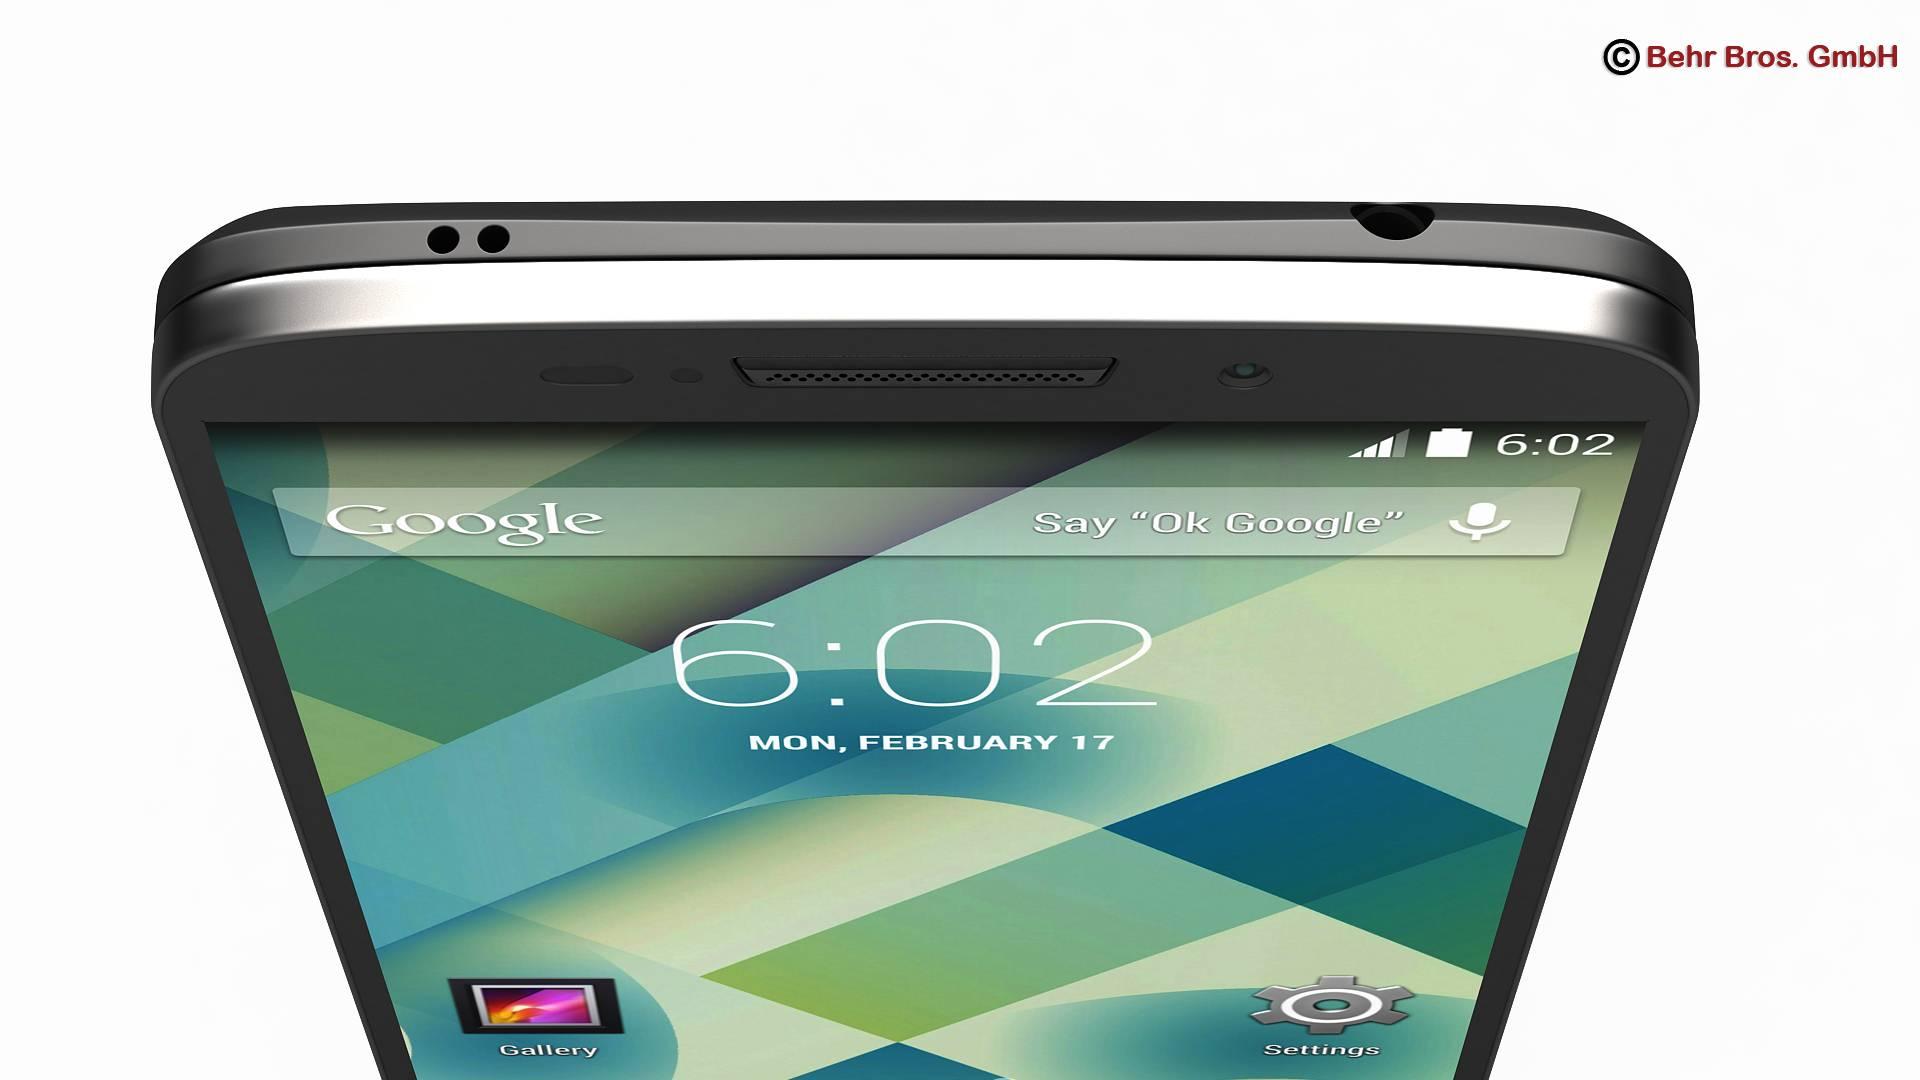 generic smartphone 5.2 inch 3d model 3ds max fbx c4d lwo ma mb obj 161649